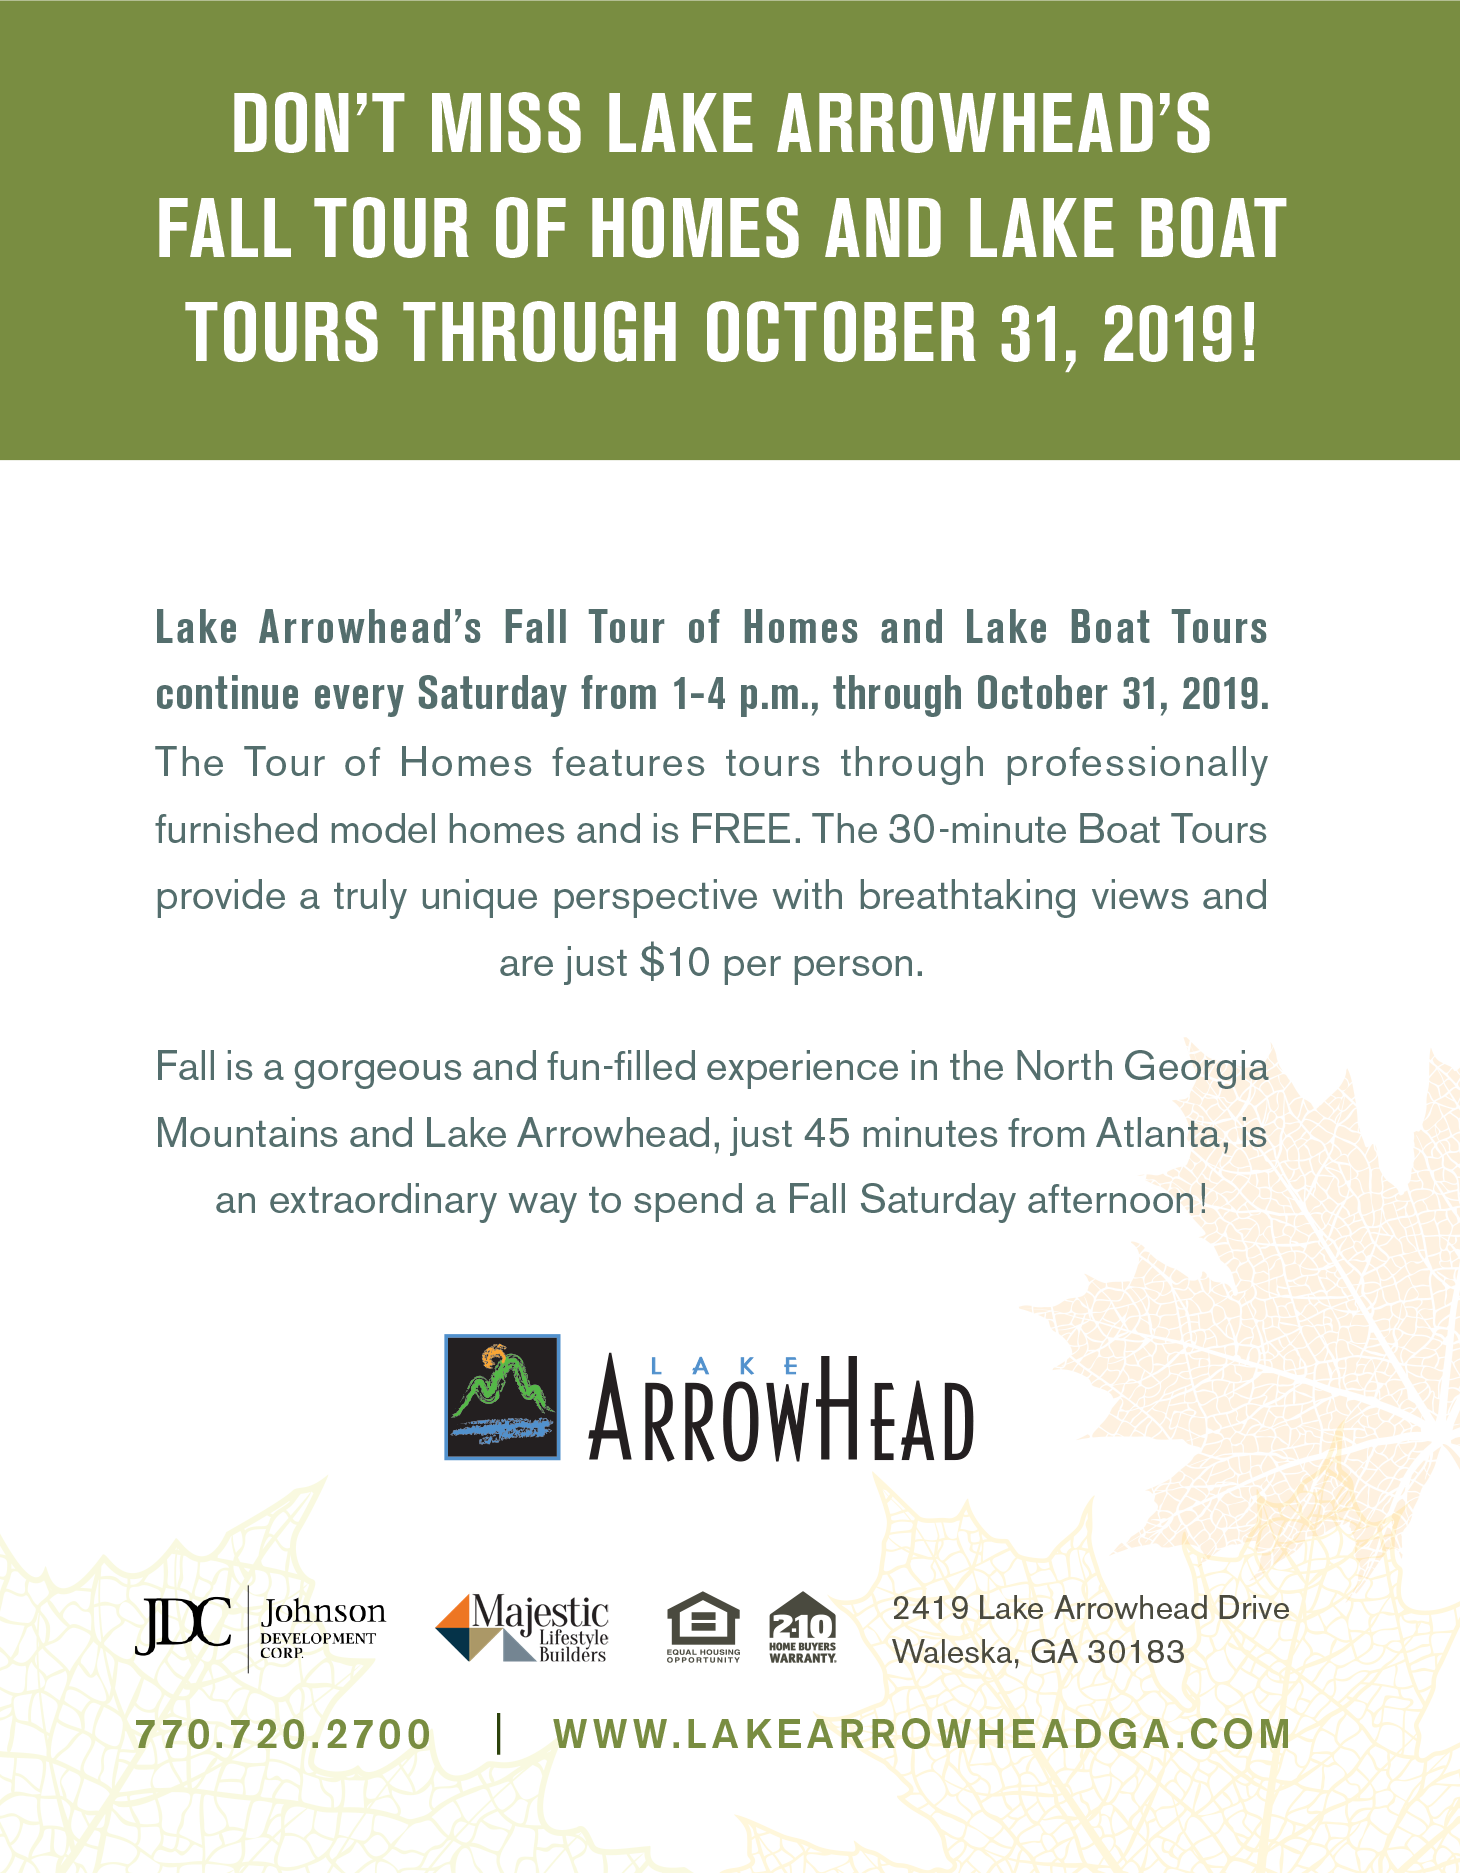 Lake Arrowhead Tour of Homes & Boat Tours 2019